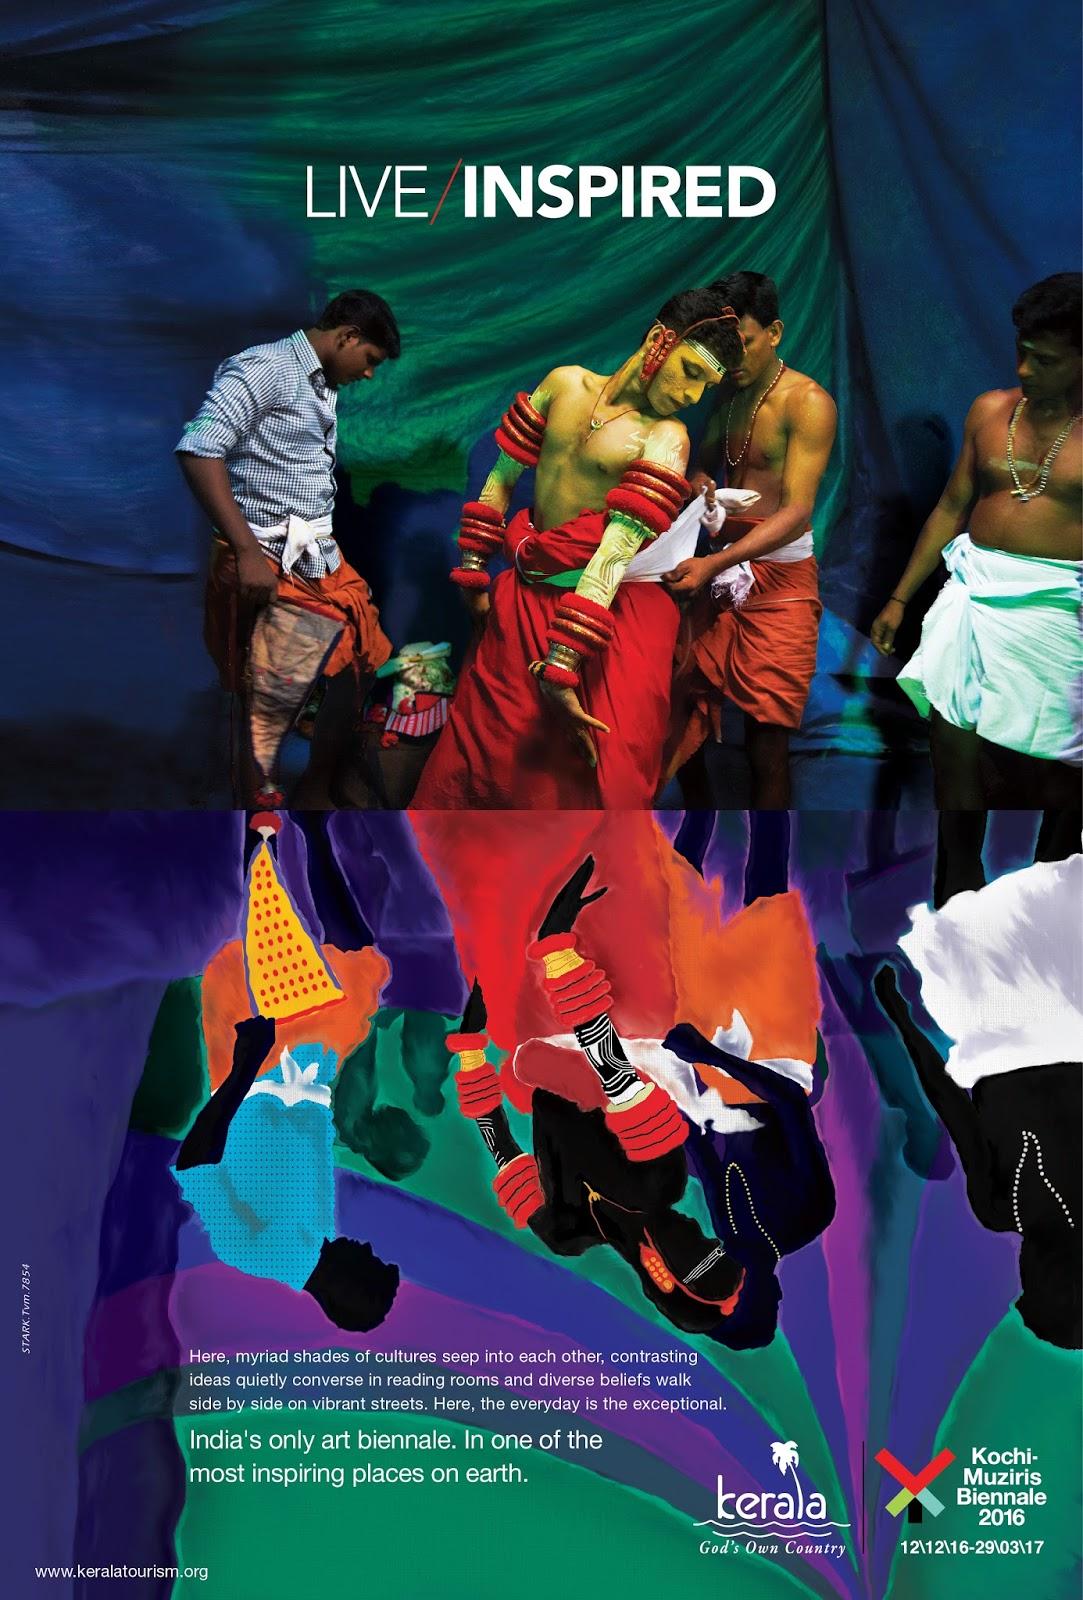 Live Inspired - Kochi - Muziris Biennale 2016 - 2 | Stark Communications Pvt Ltd